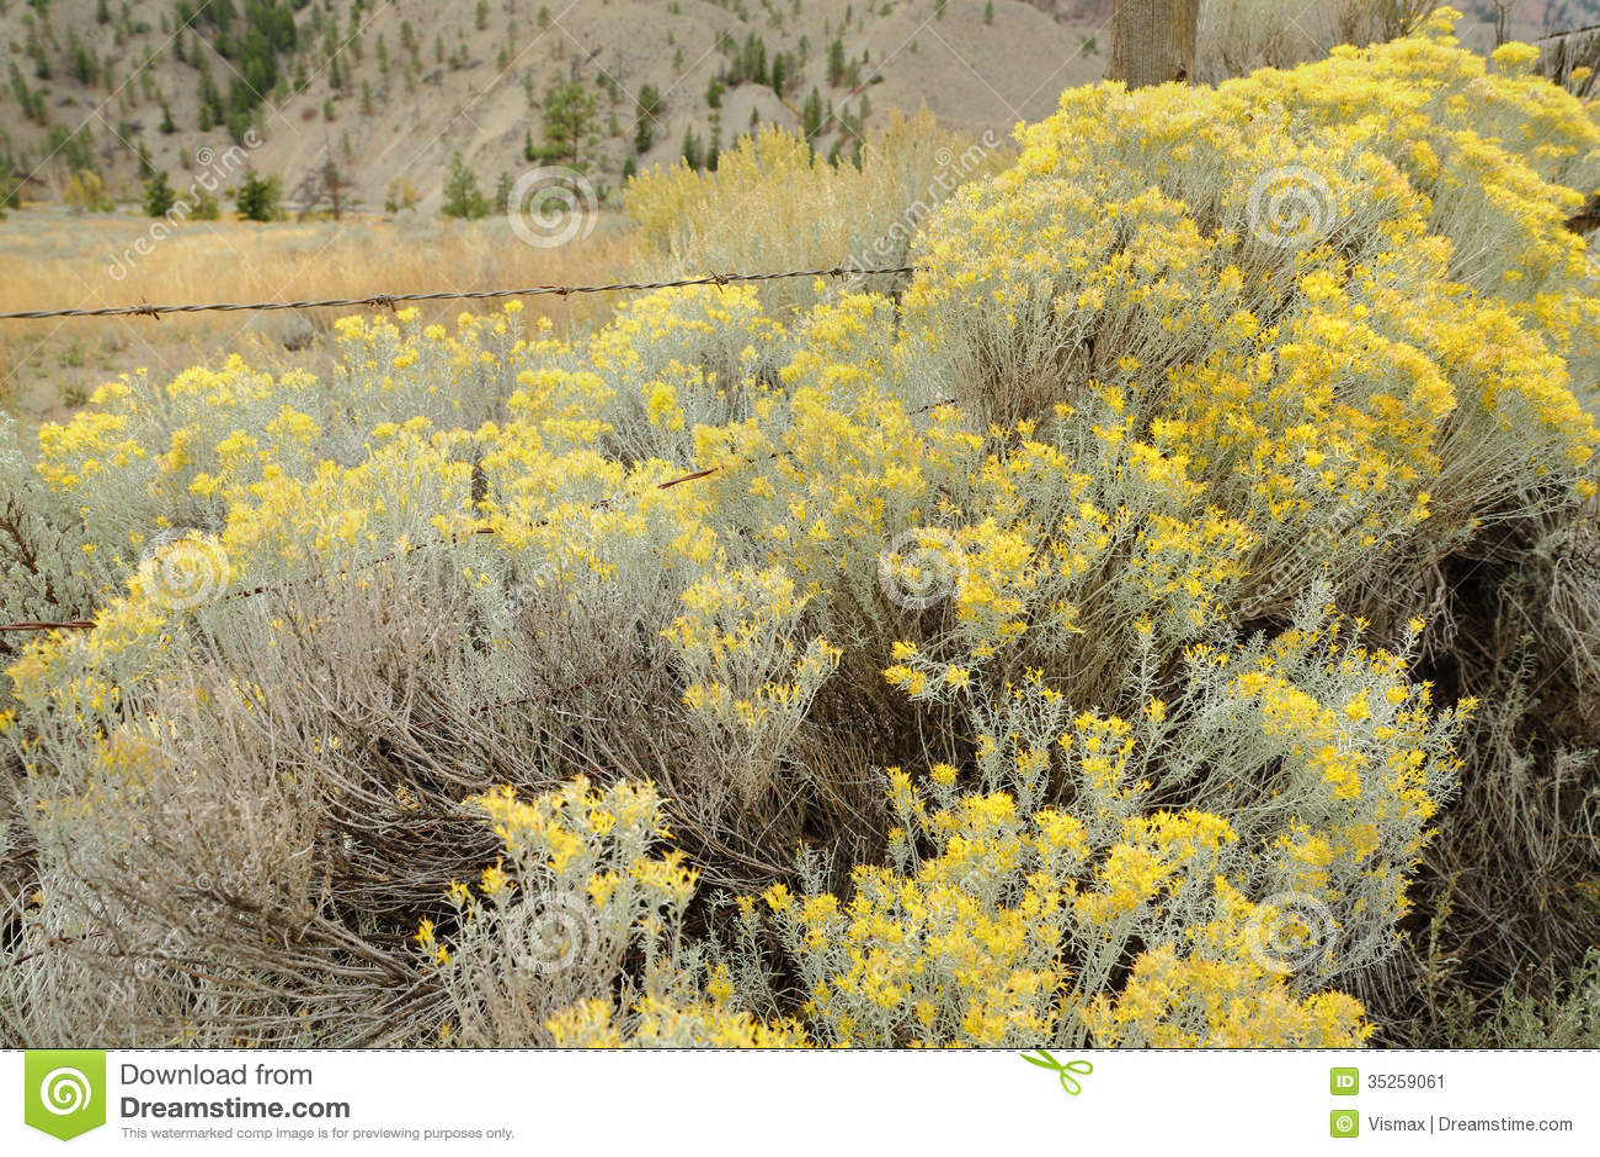 Flowering Sagebrush And Ranch Fence Stock Image Image